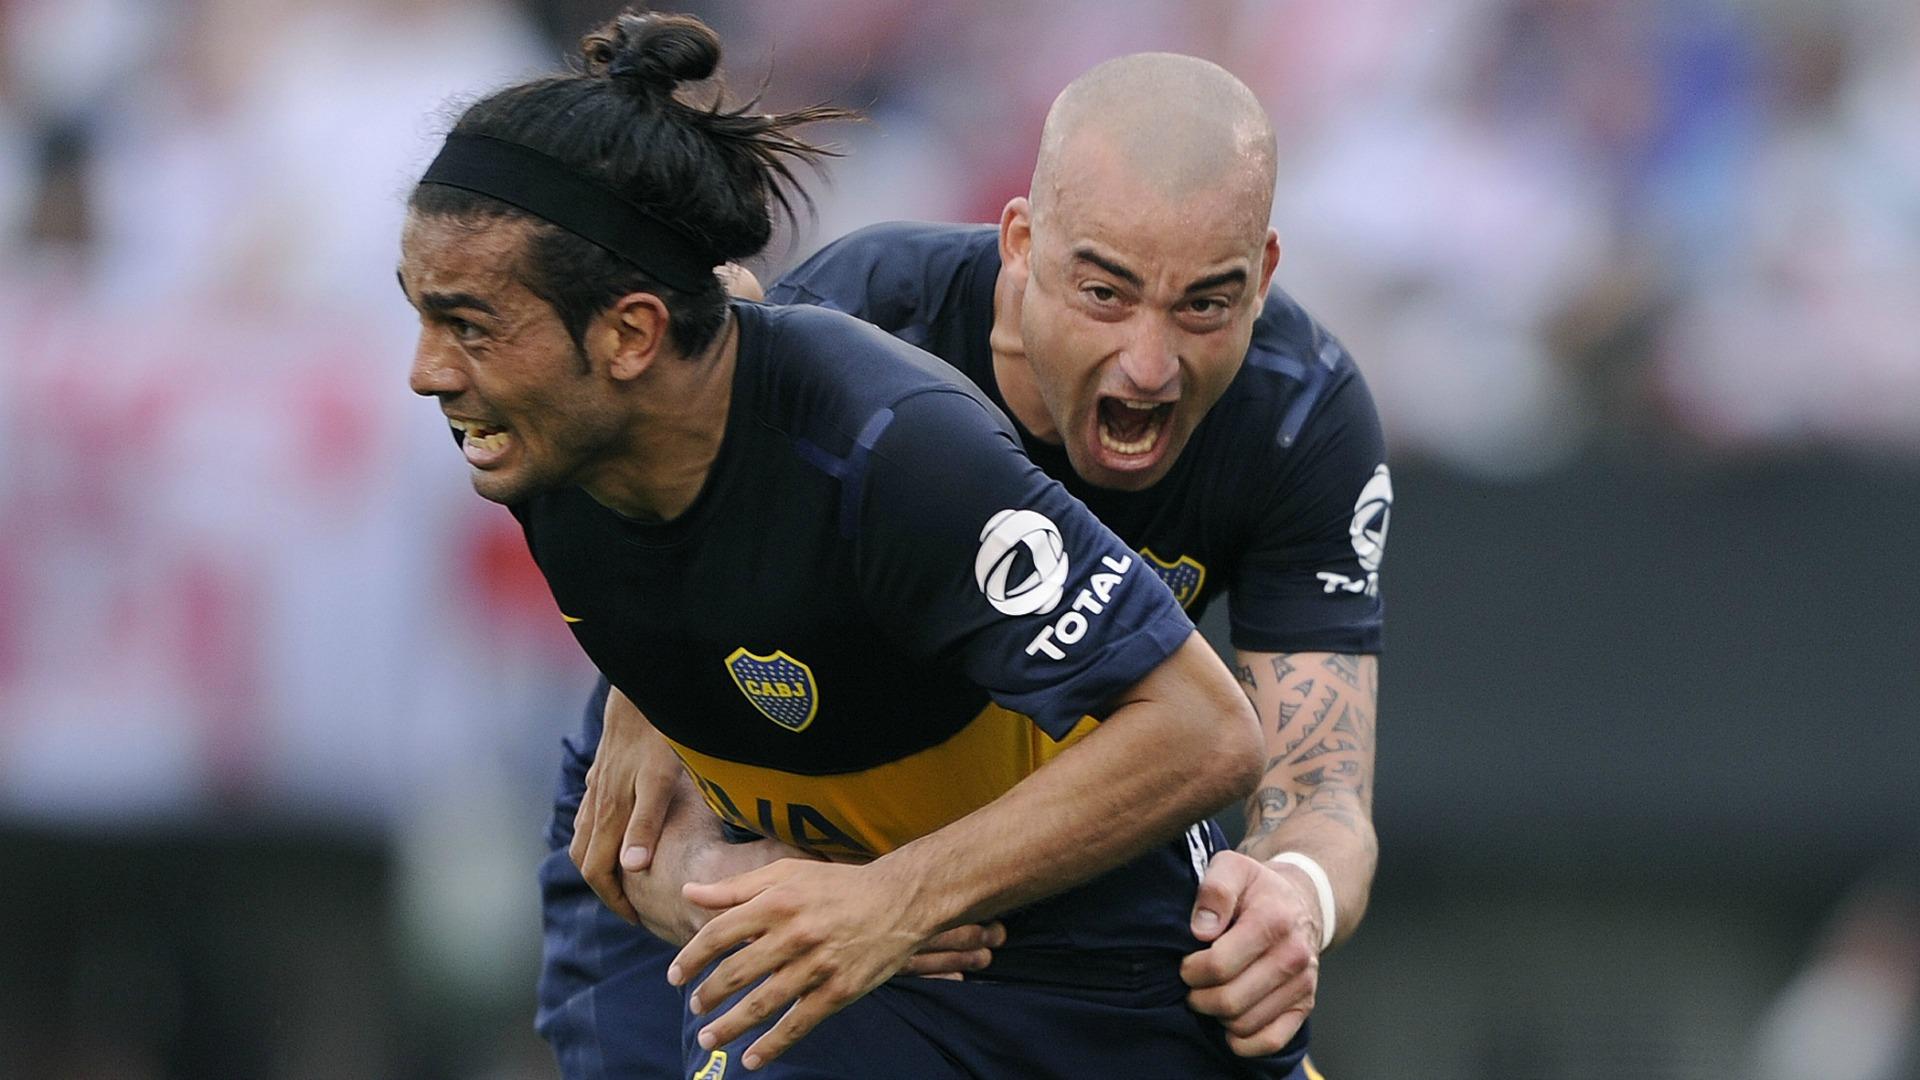 Waler Erviti y Santiago Silva Boca Juniors 2012